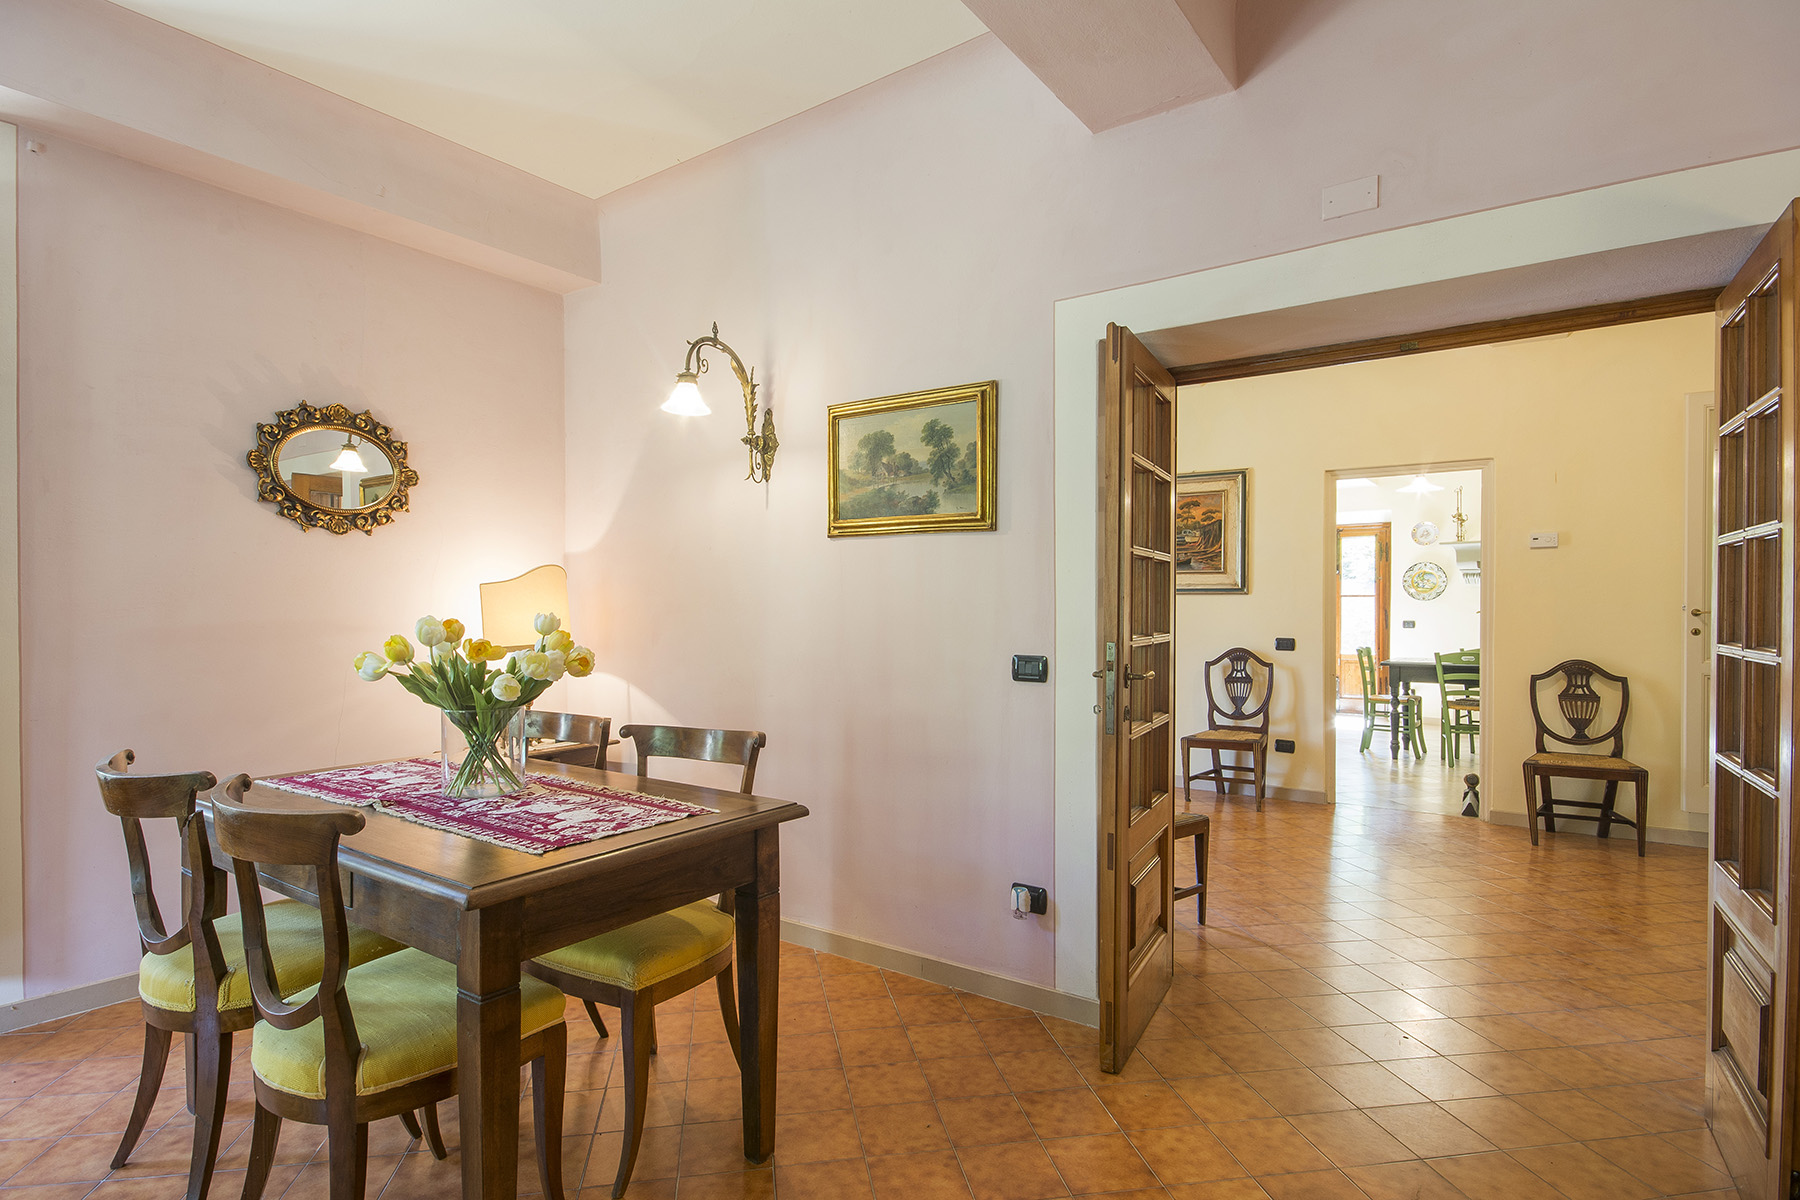 Villa in Vendita a Lucca: 5 locali, 1150 mq - Foto 17